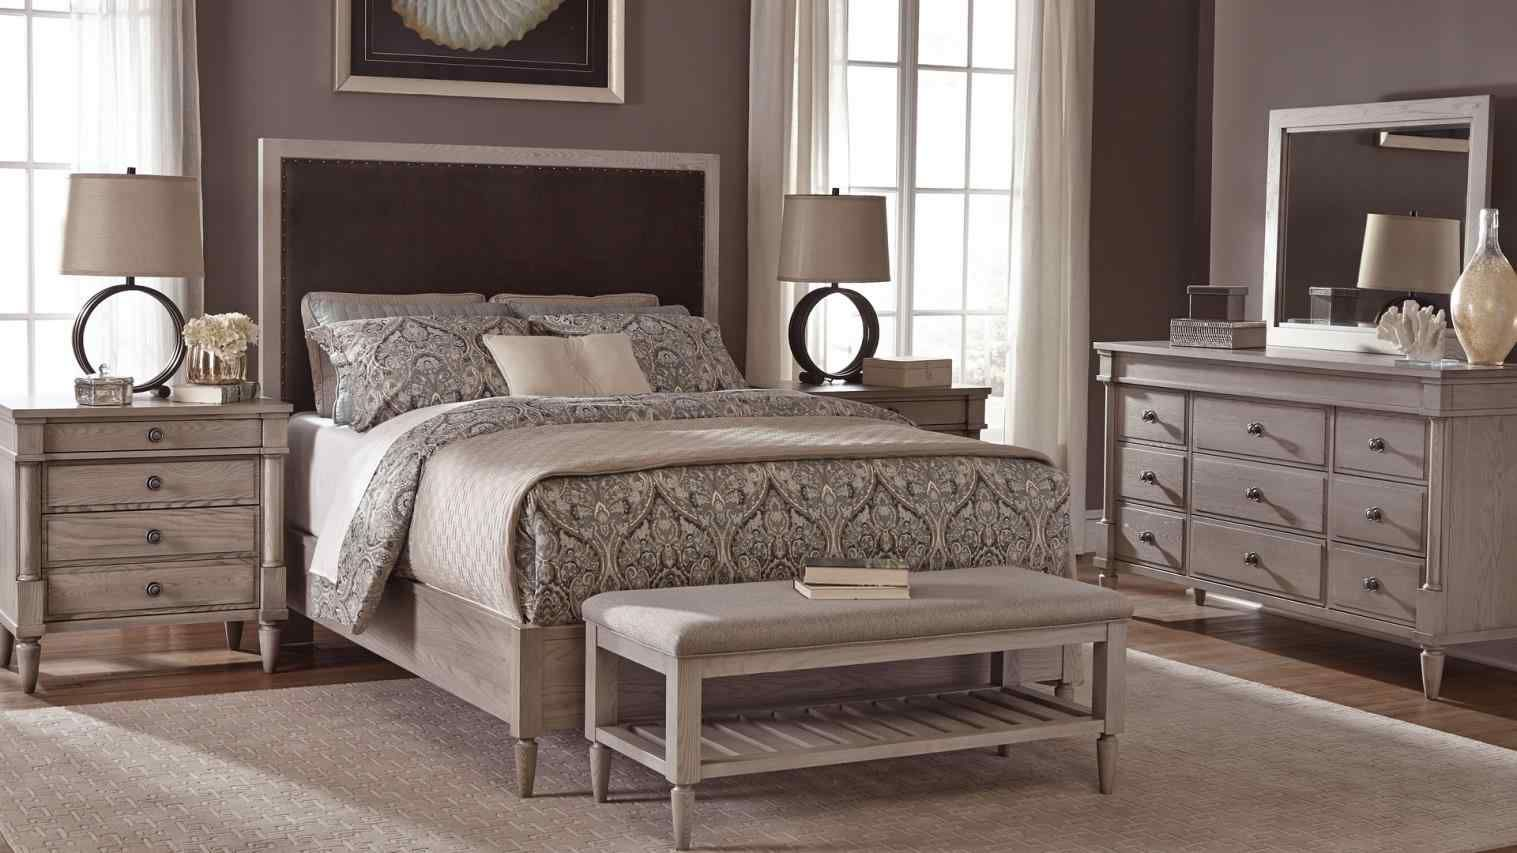 New Post Furniture Design Bedroom Sets Pakistani Has Been Published On Ash999